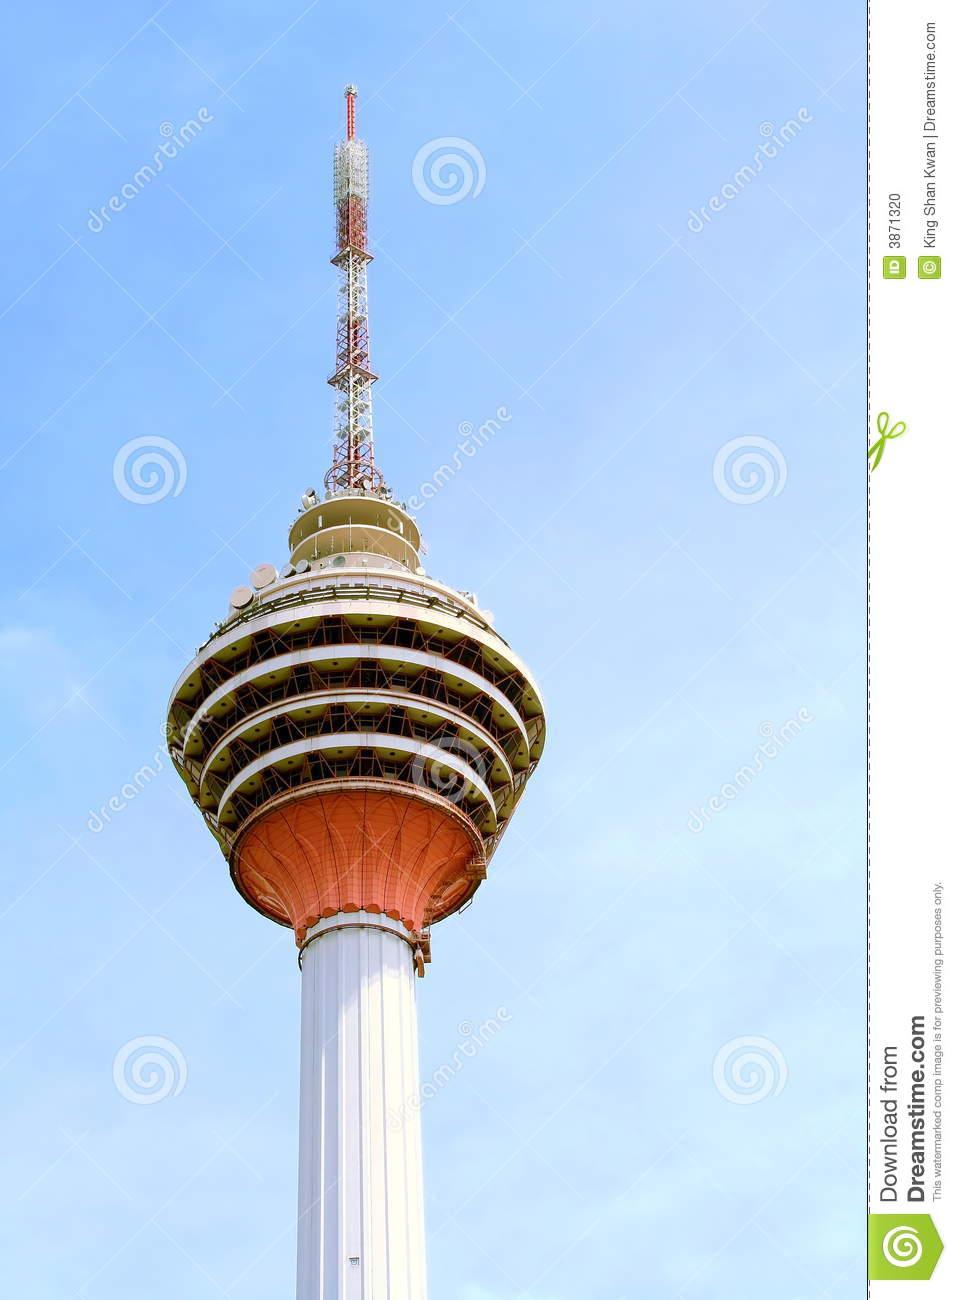 Kuala Lumpur Tv Tower Stock Photo.